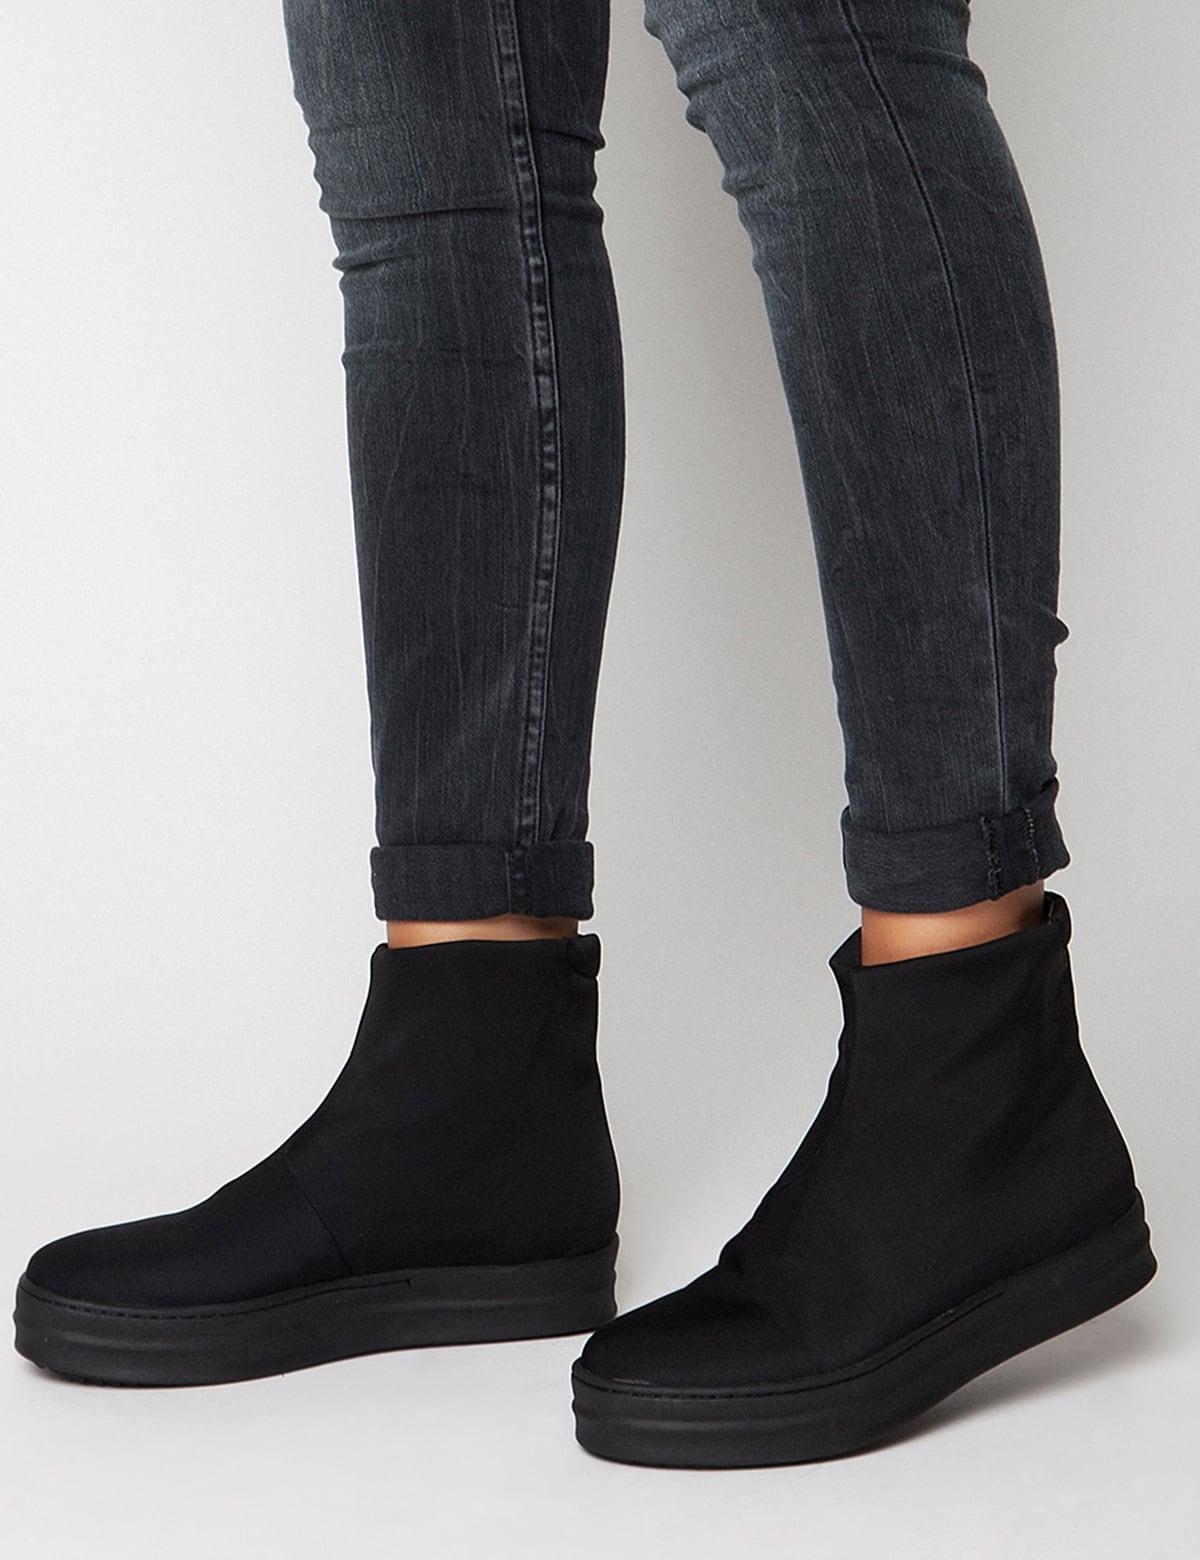 Lara Black mrs fred   sneakers